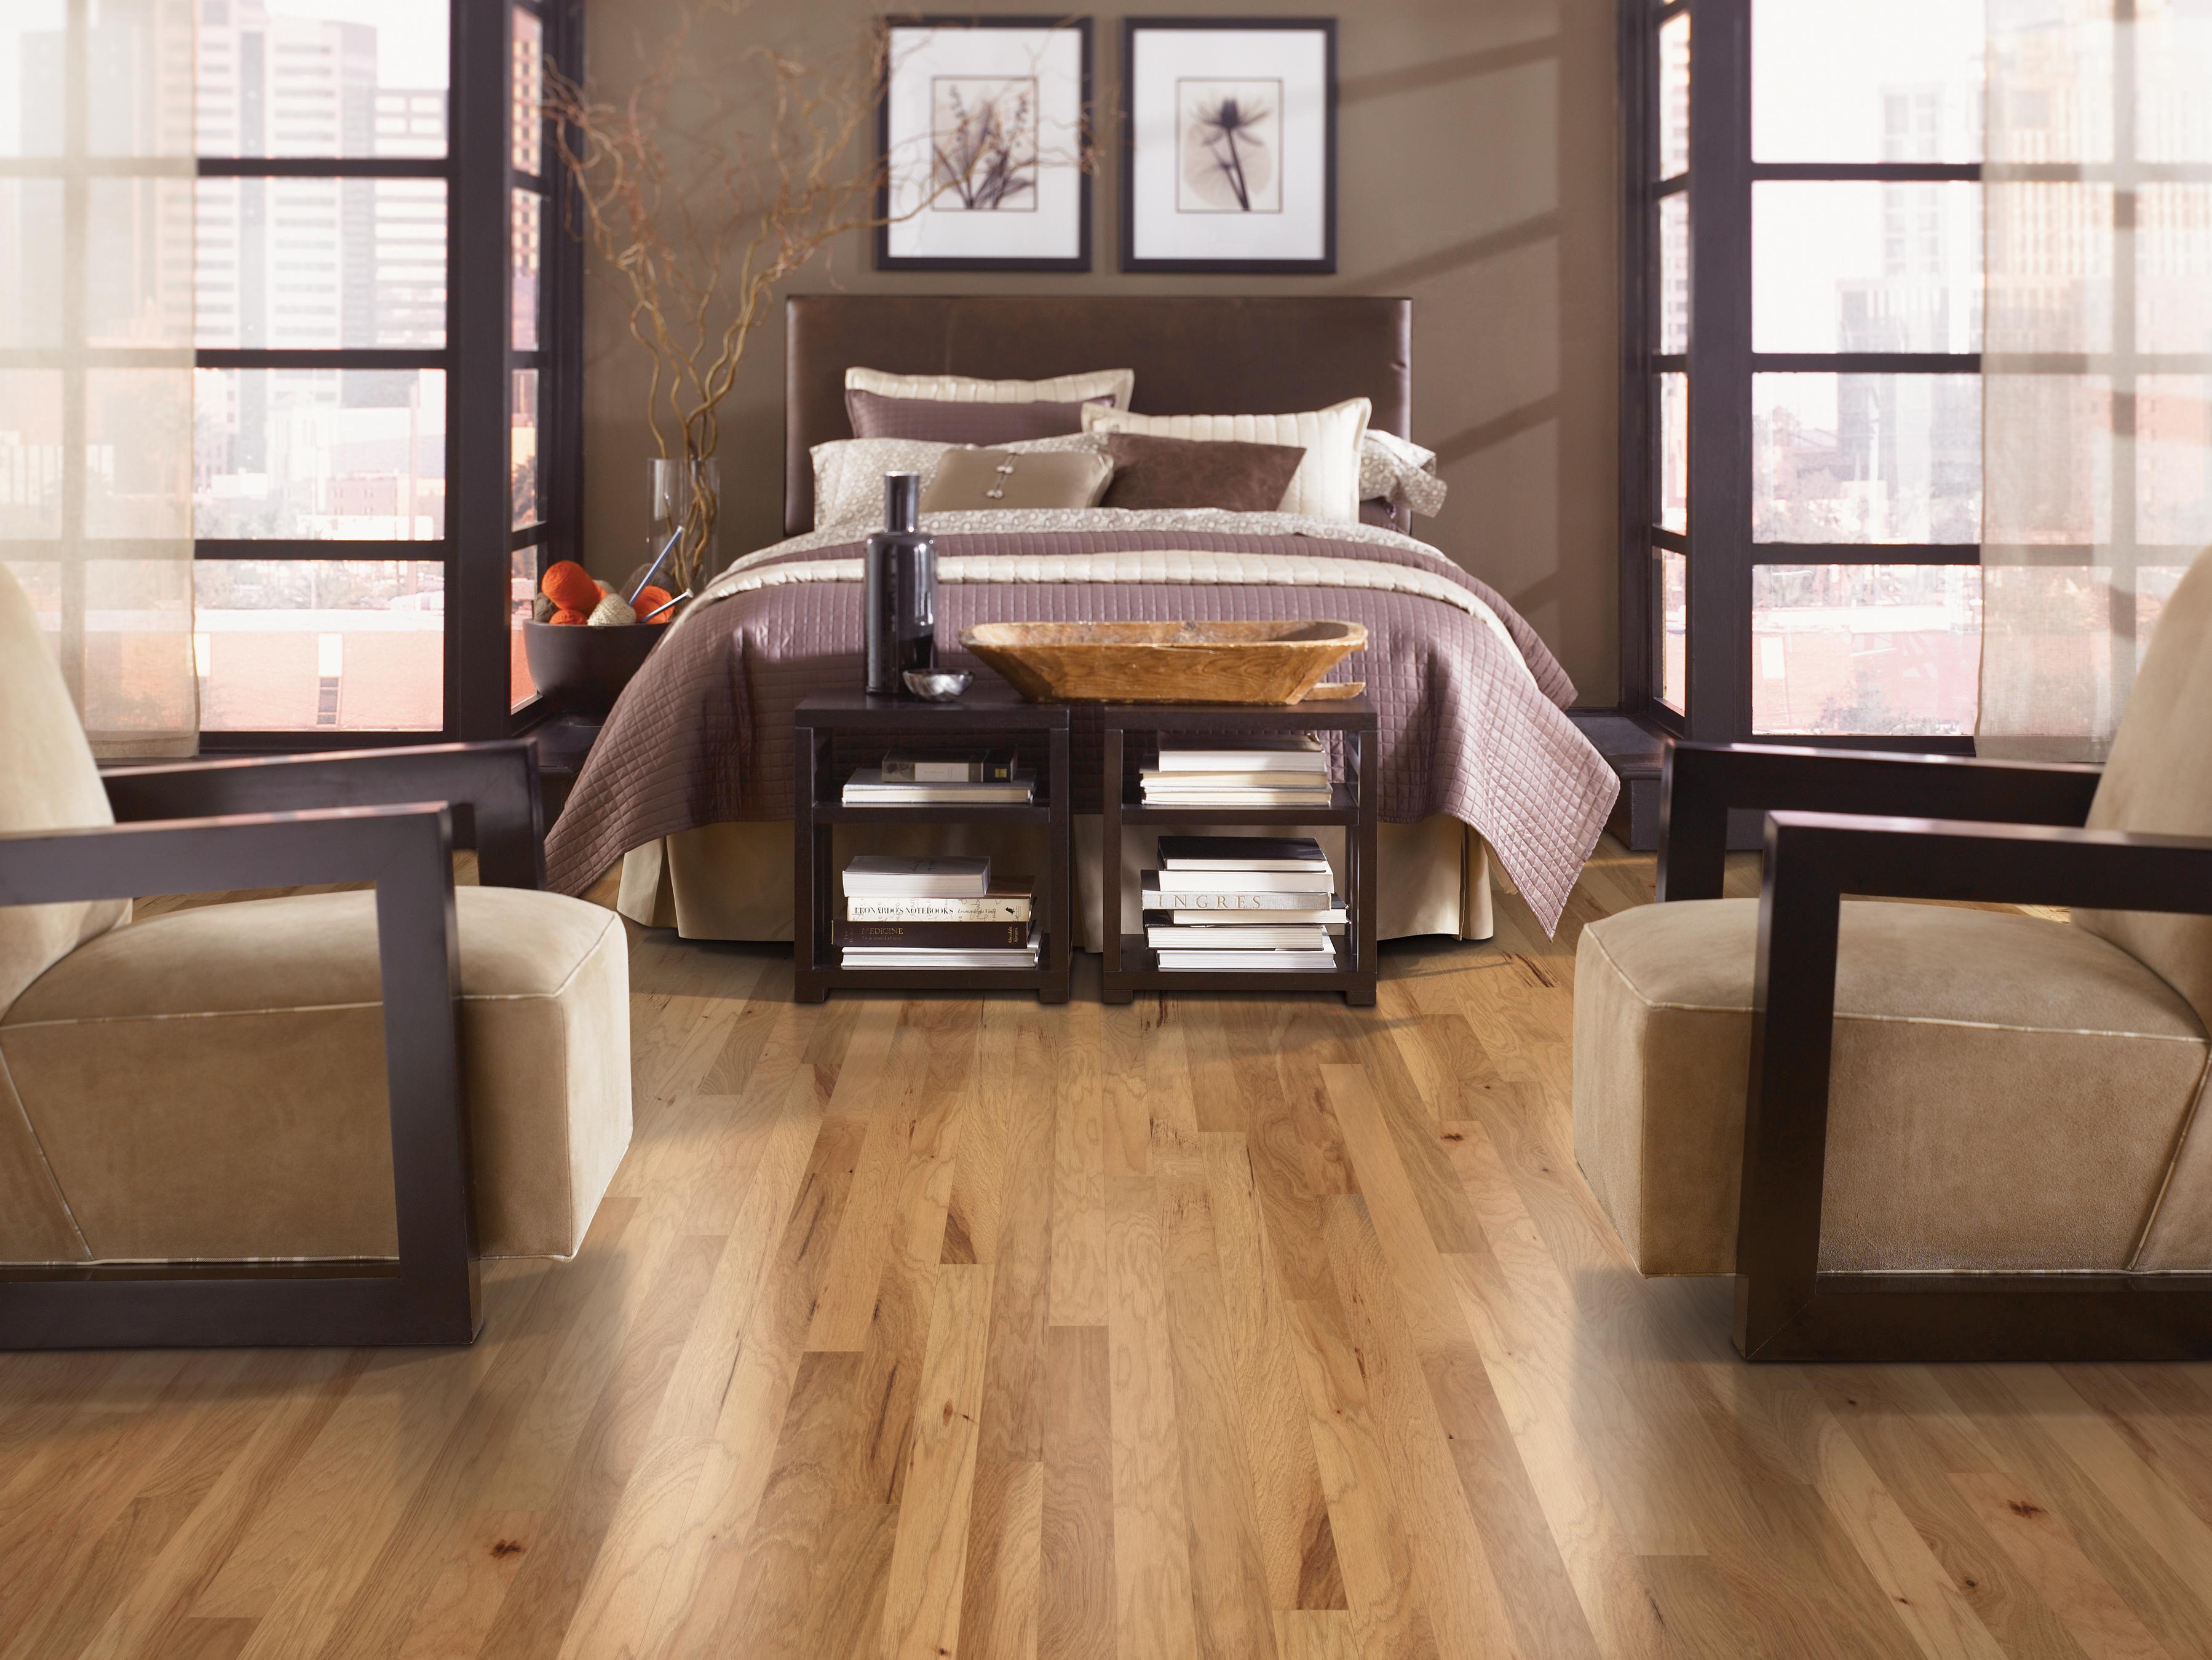 Custom Home Interiors. Custom Home Interiors I